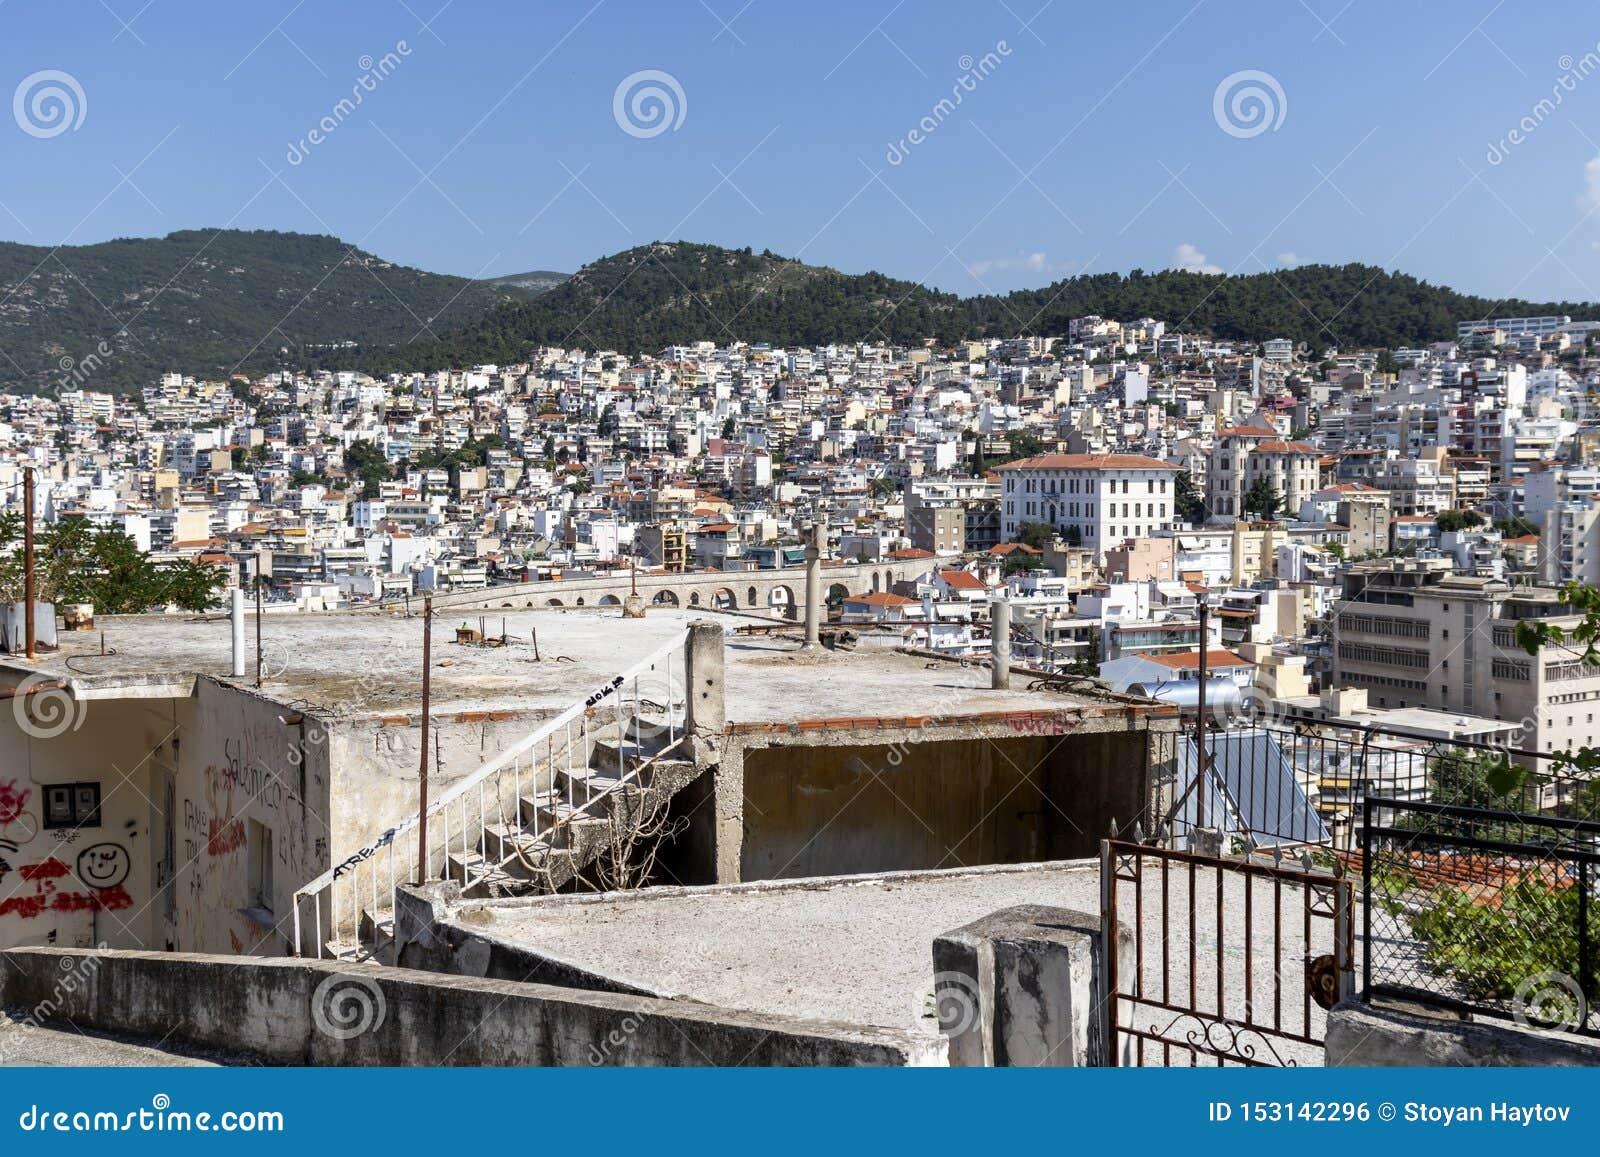 Panoramic view to city of Kavala, Greece